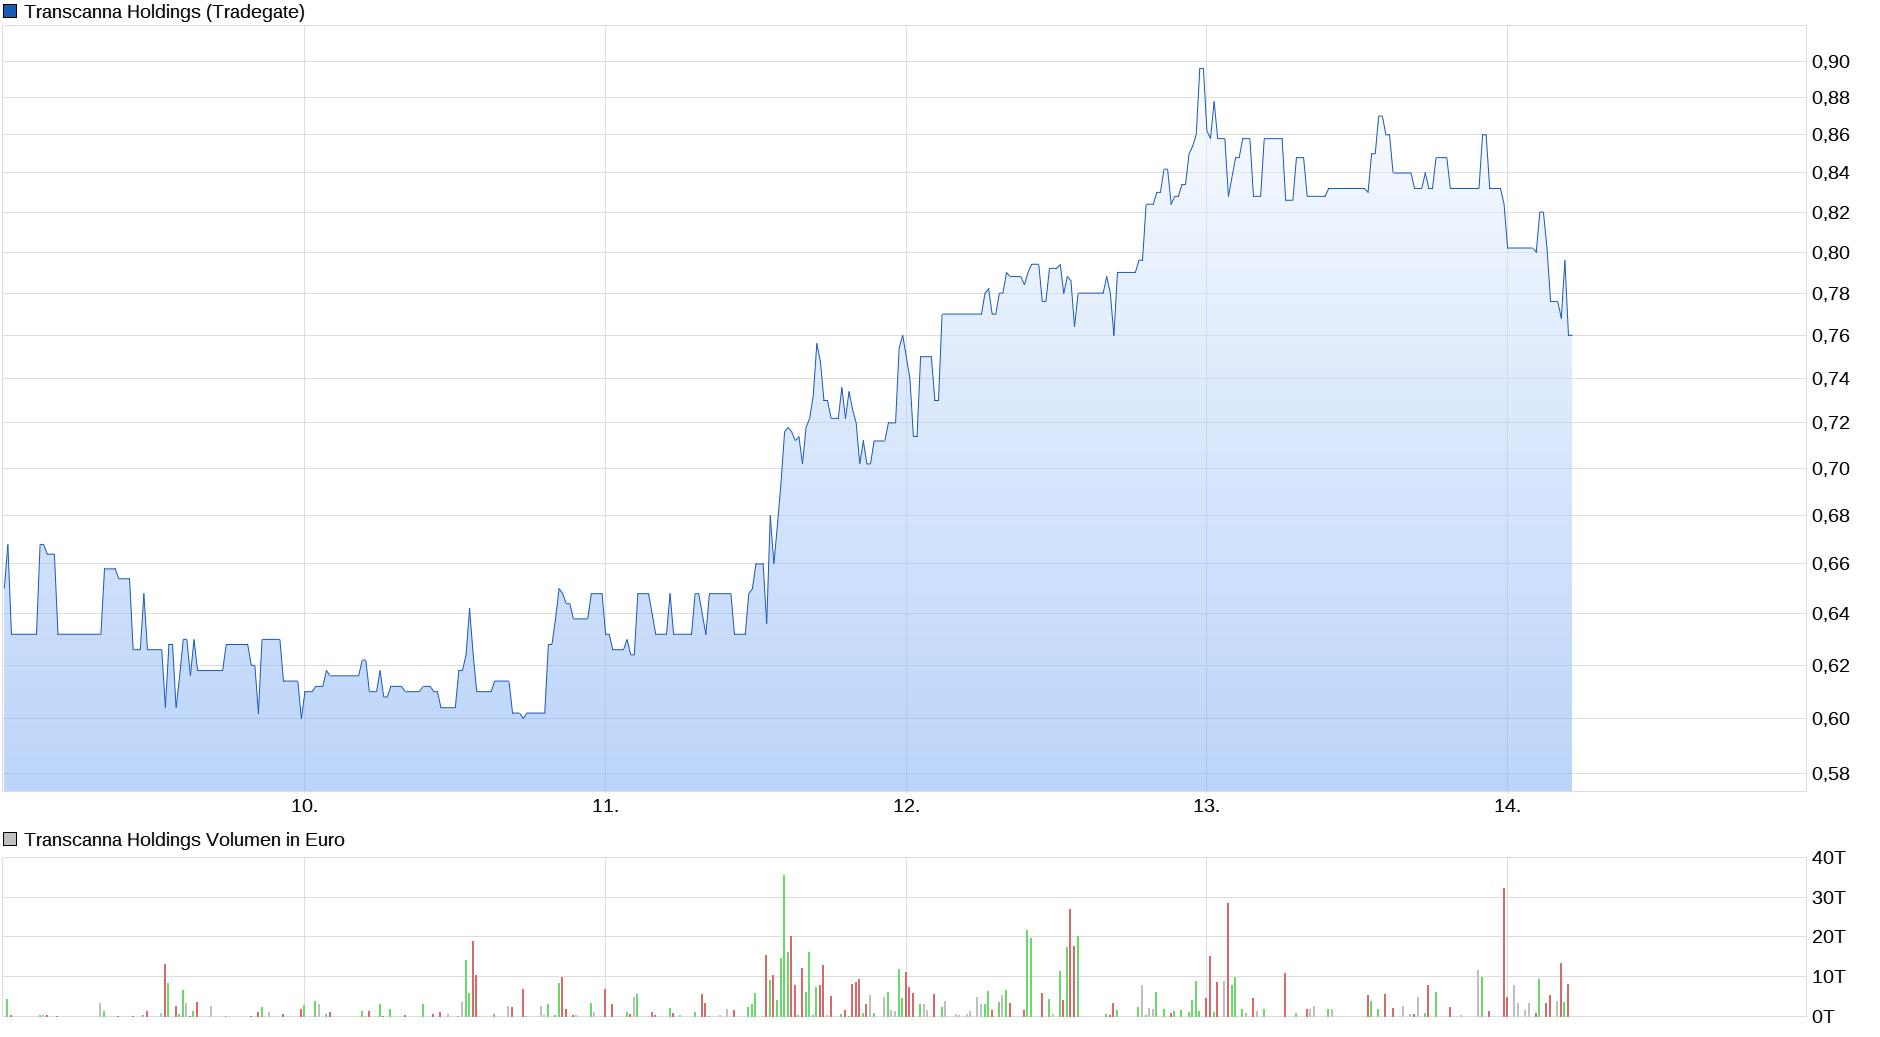 chart_week_transcannaholdings.png